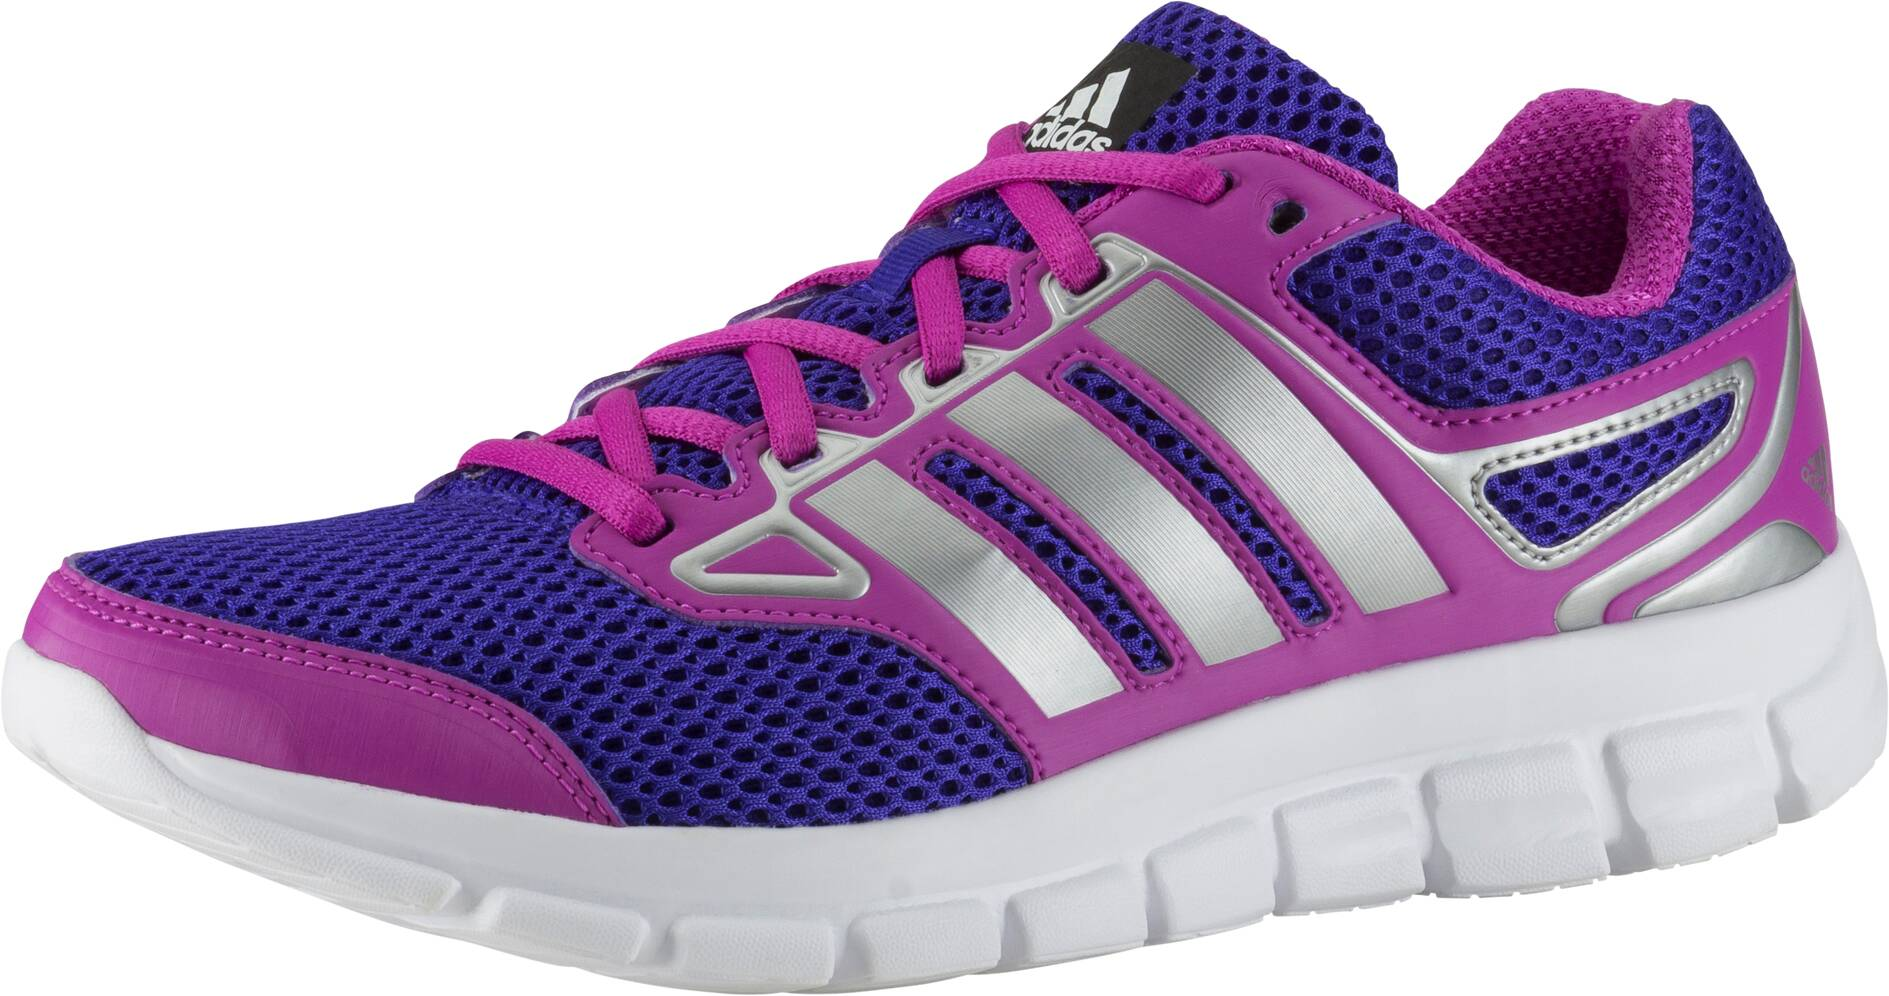 pretty nice cf5c9 b6ba7 4e062 4e062 invigor 096d3 max intersport air sneaker kick nxT5UawEq